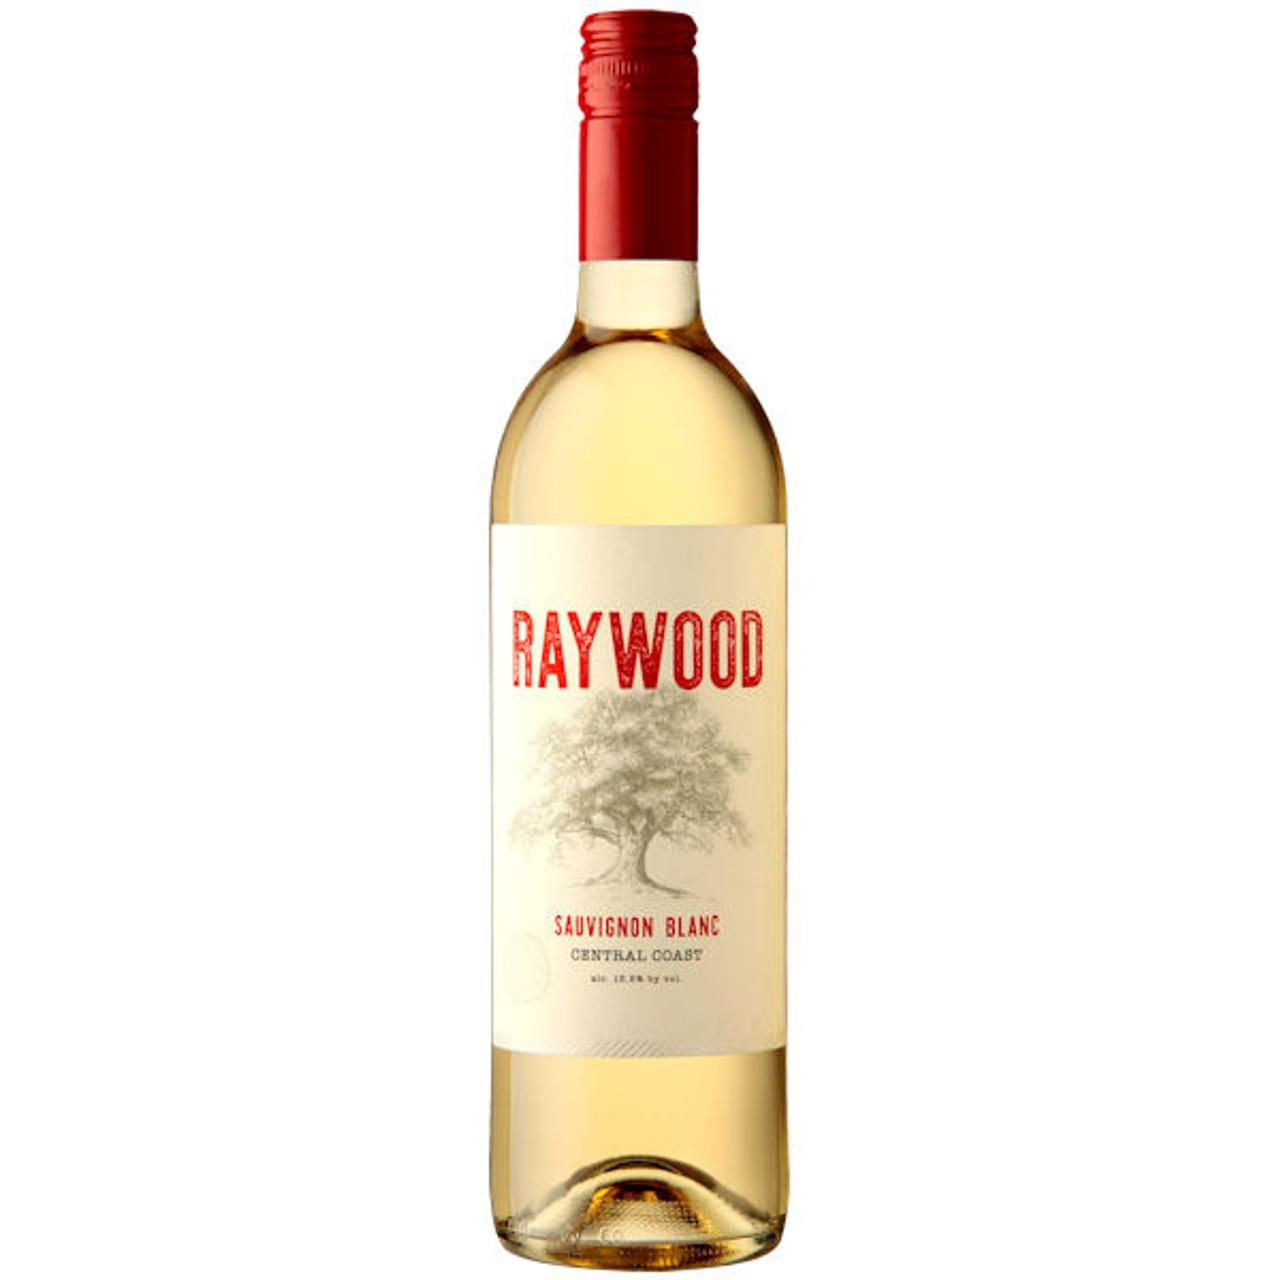 Raywood Central Coast Sauvignon Blanc 715322151612